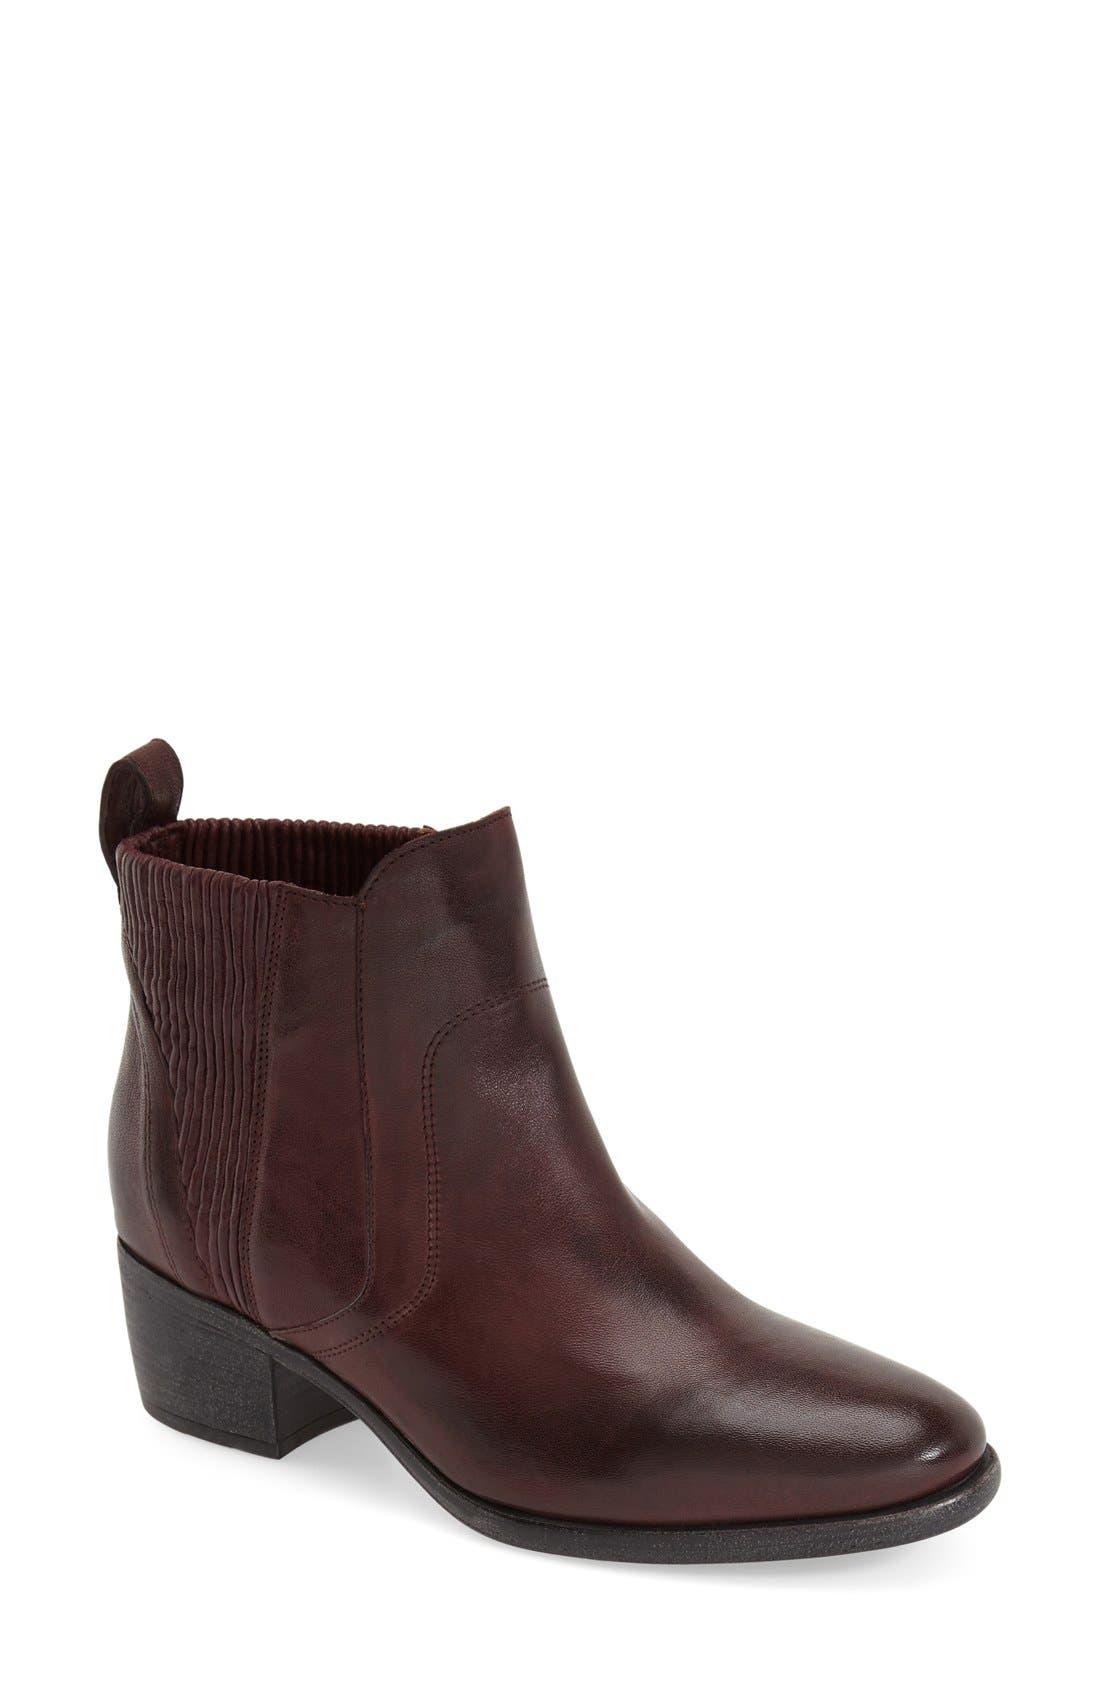 Alternate Image 1 Selected - UGG® Collection 'Felisa' Boot (Women)